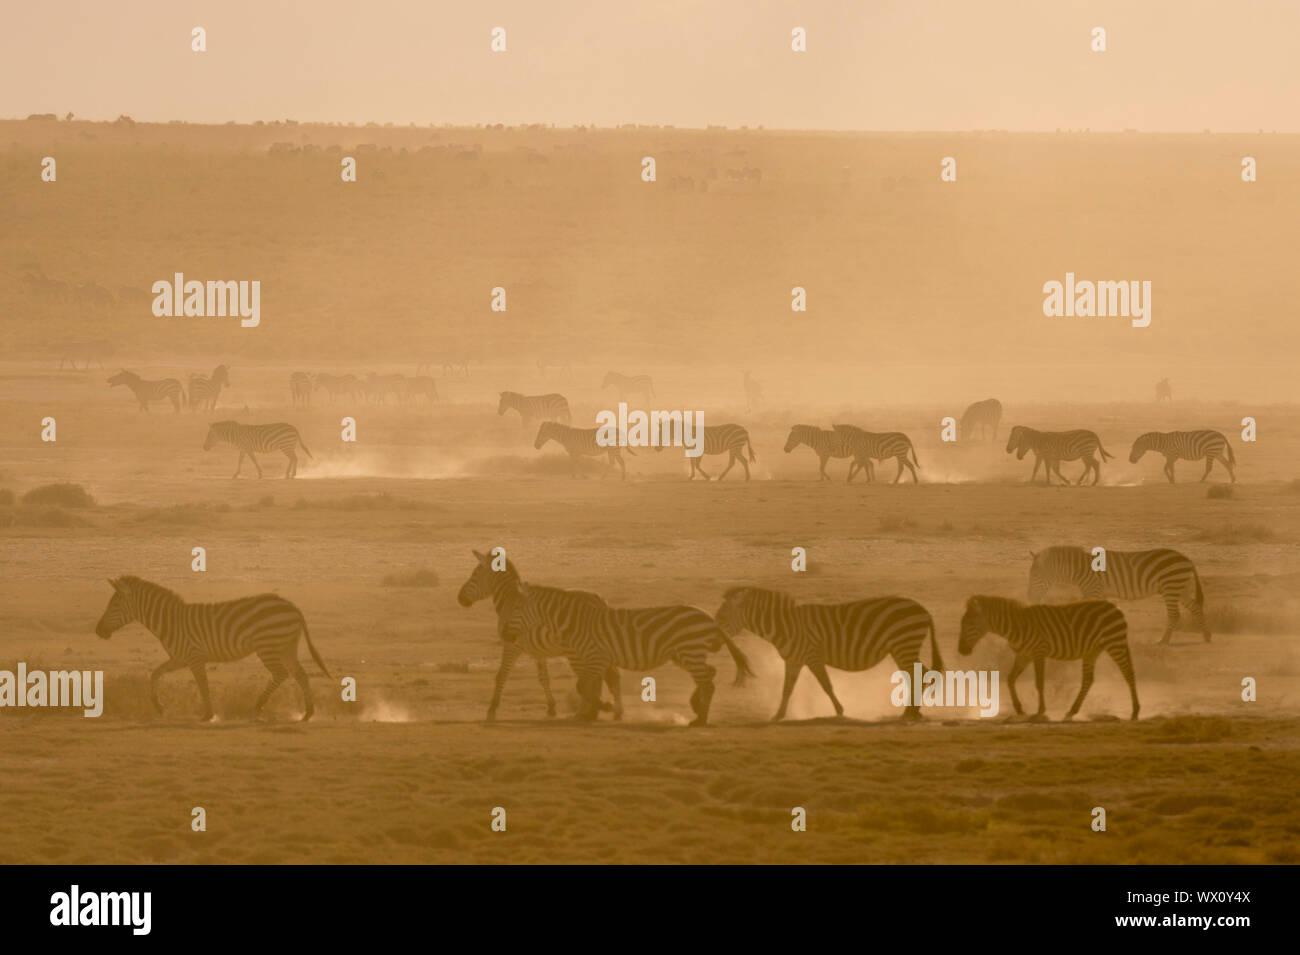 Ebenen Zebras (Equus quagga) Wandern in Staub bei Sonnenuntergang im Hidden Valley, Tansania, Ostafrika, Südafrika Stockfoto